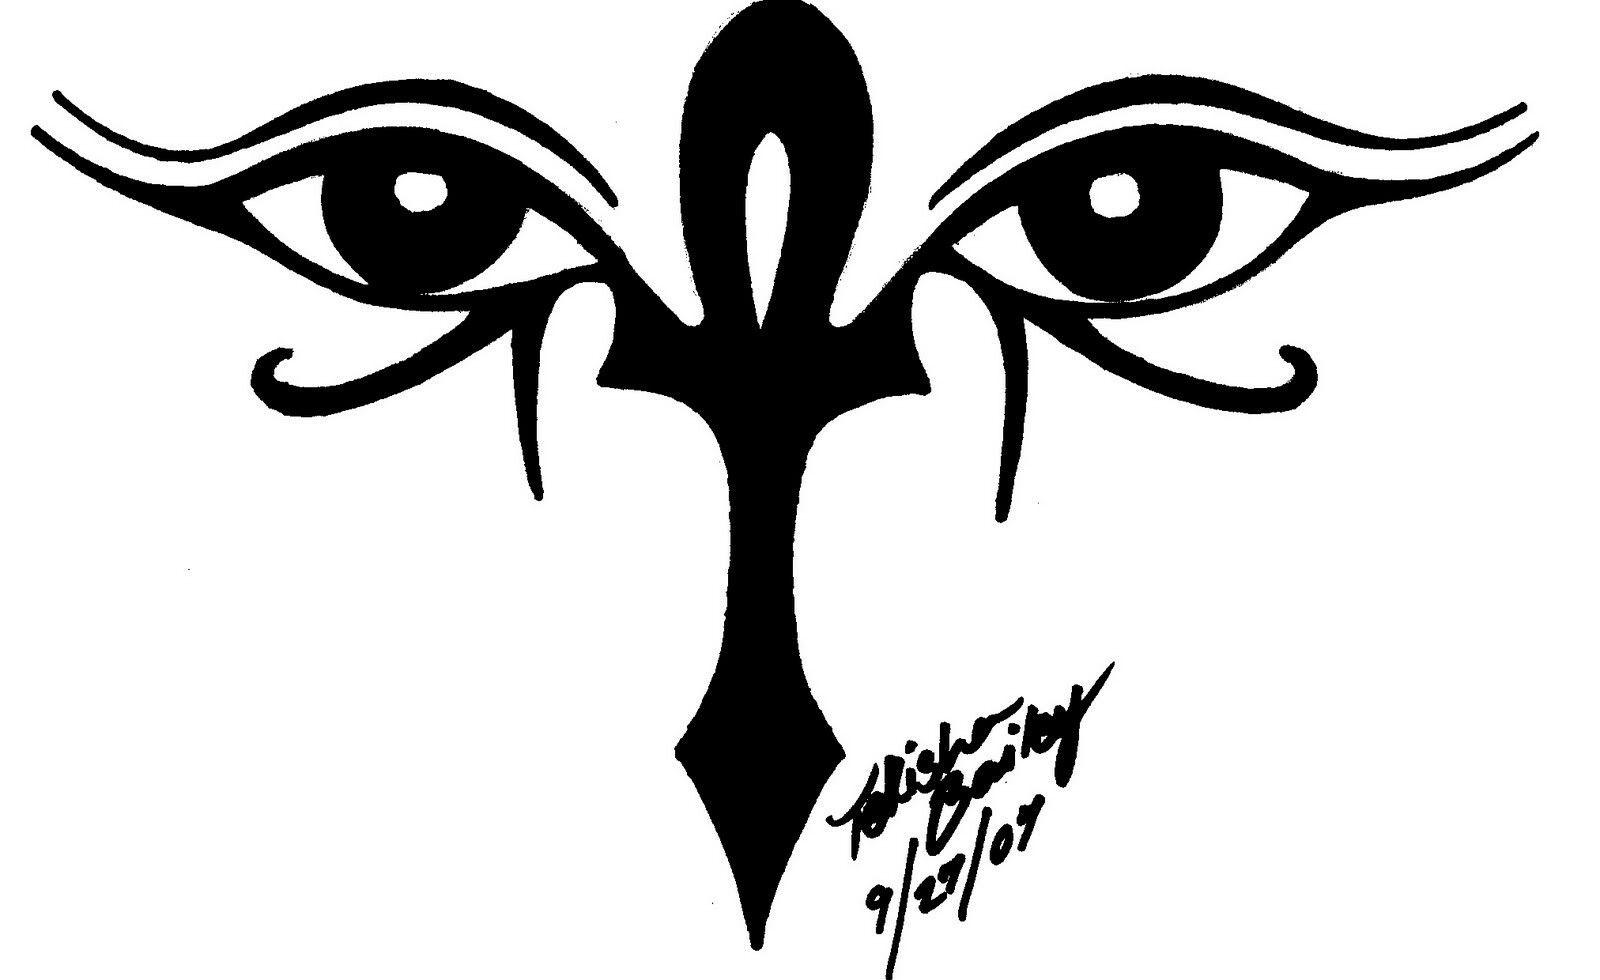 ef1373a49 Eye of ra, ankh and eye of horus | Tattoo Ideas | Horus tattoo, Ankh ...